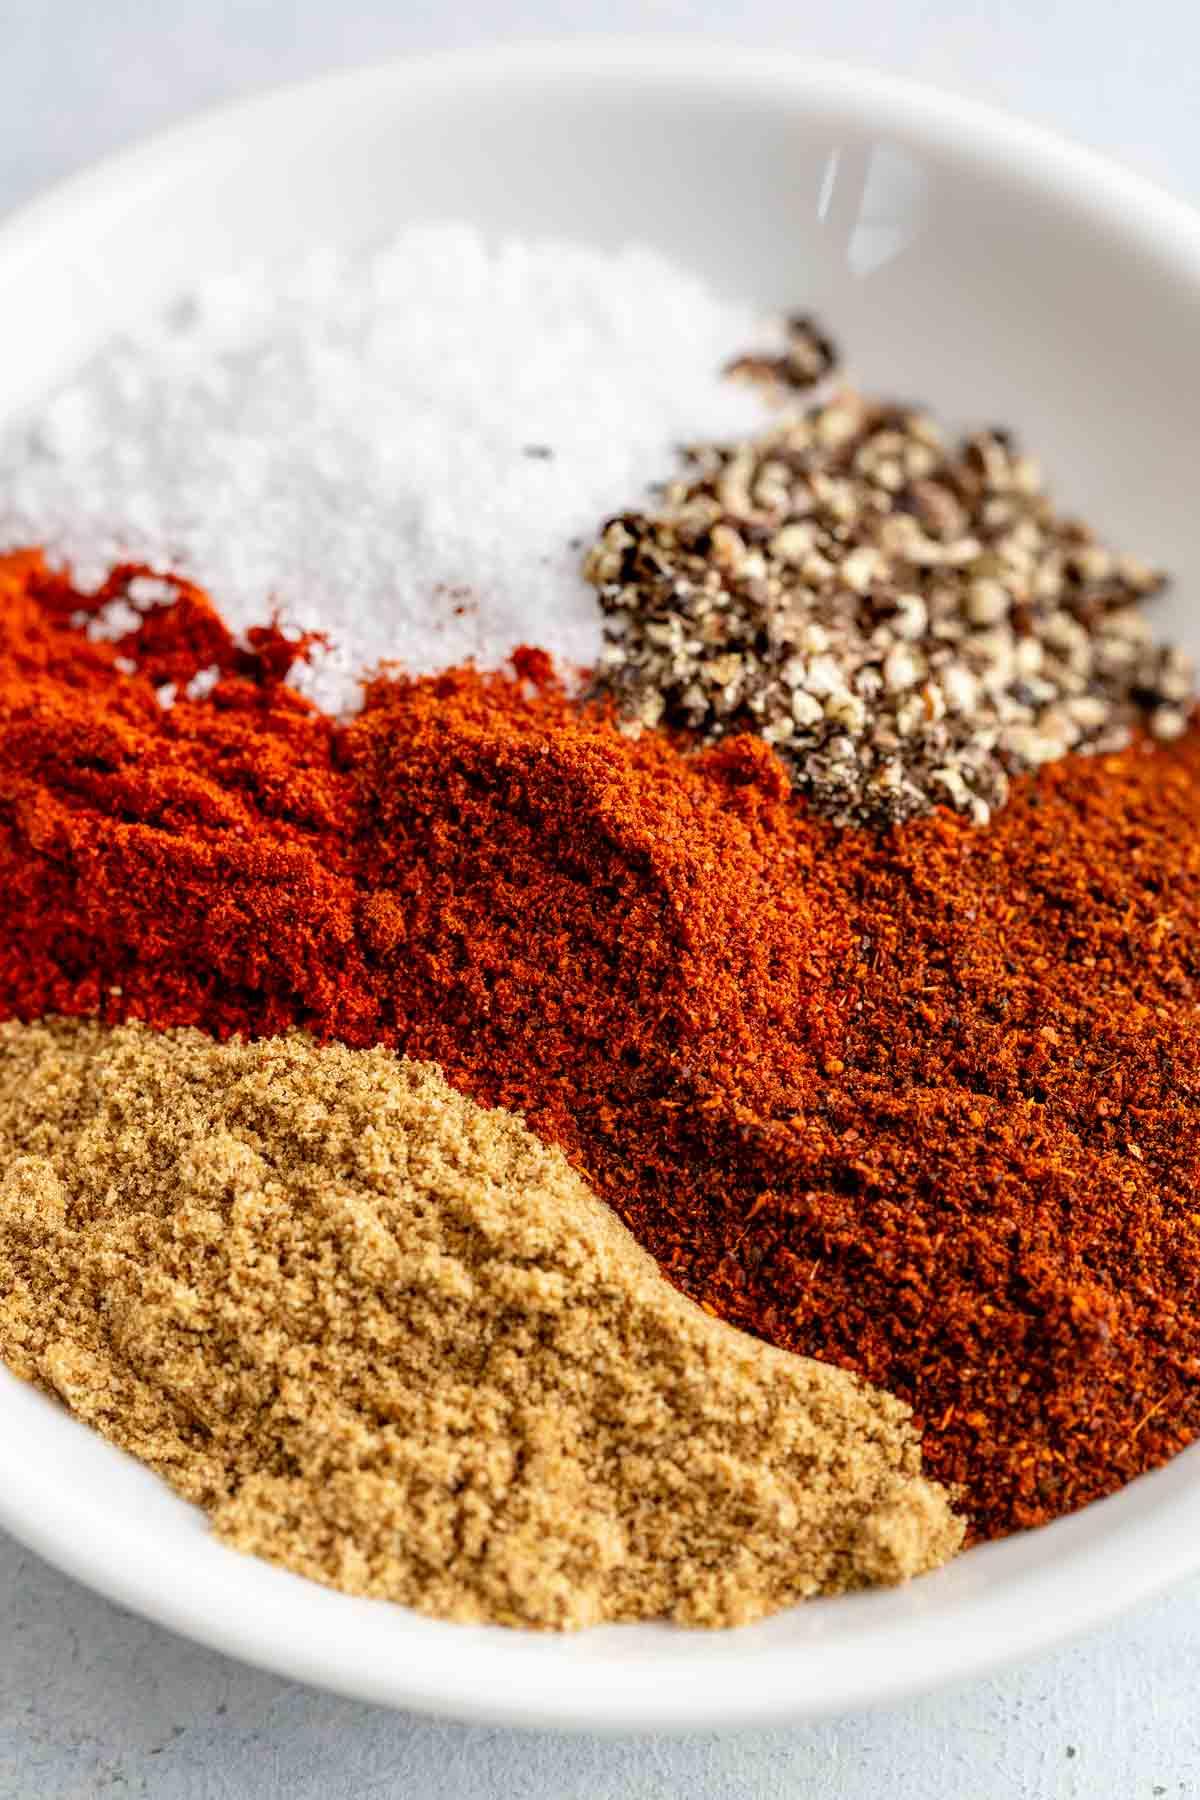 Bowl filled with chili powder, cumin, smoked paprika, chipotle chili powder, salt, and pepper